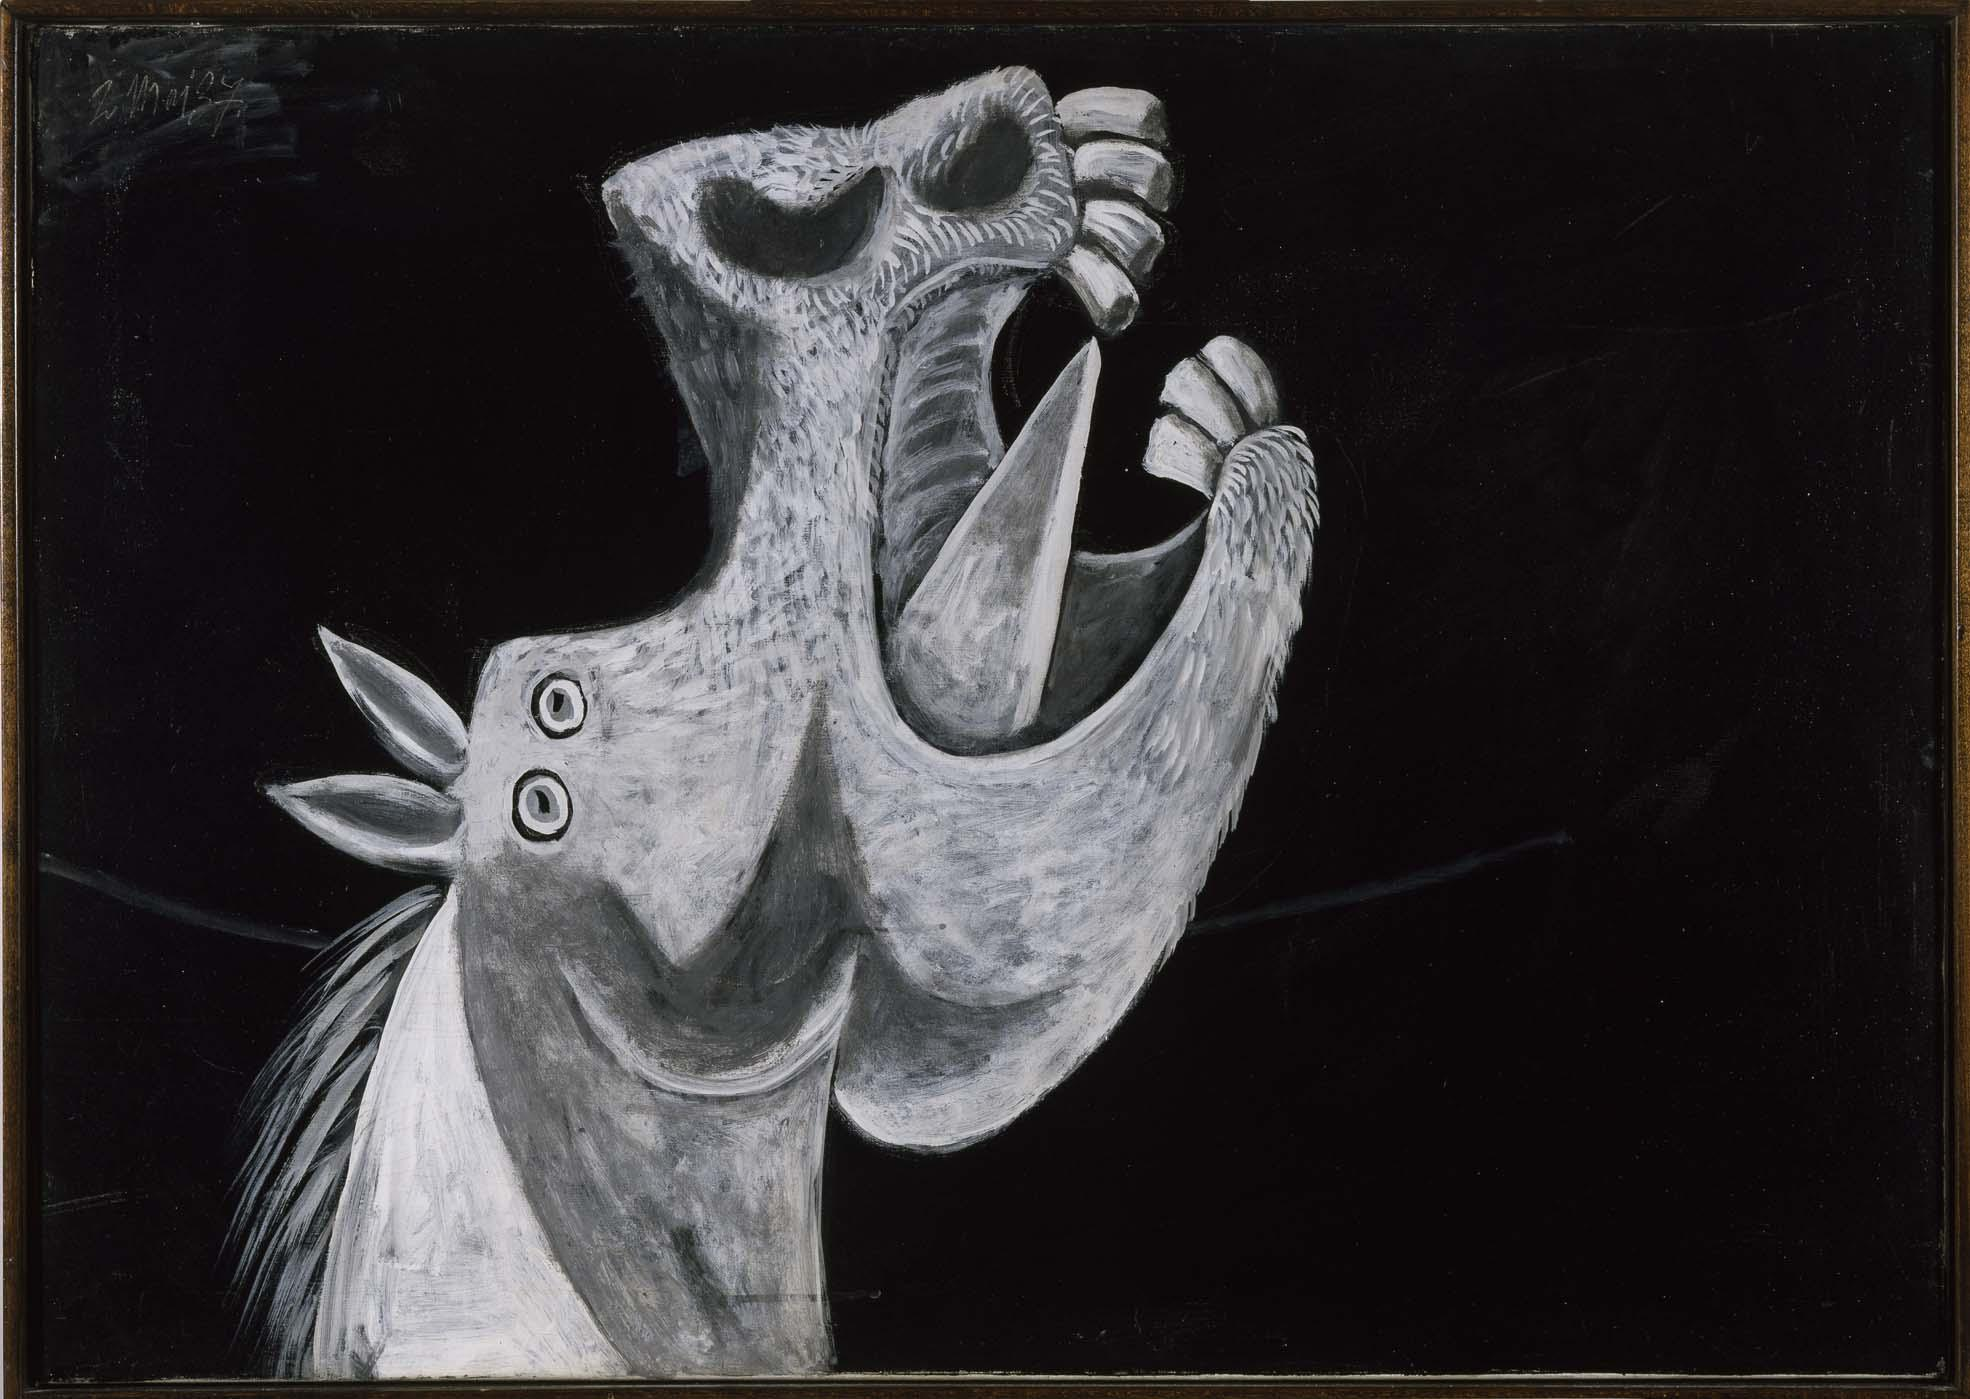 pablo picasso pablo ruiz picasso cabeza de caballo